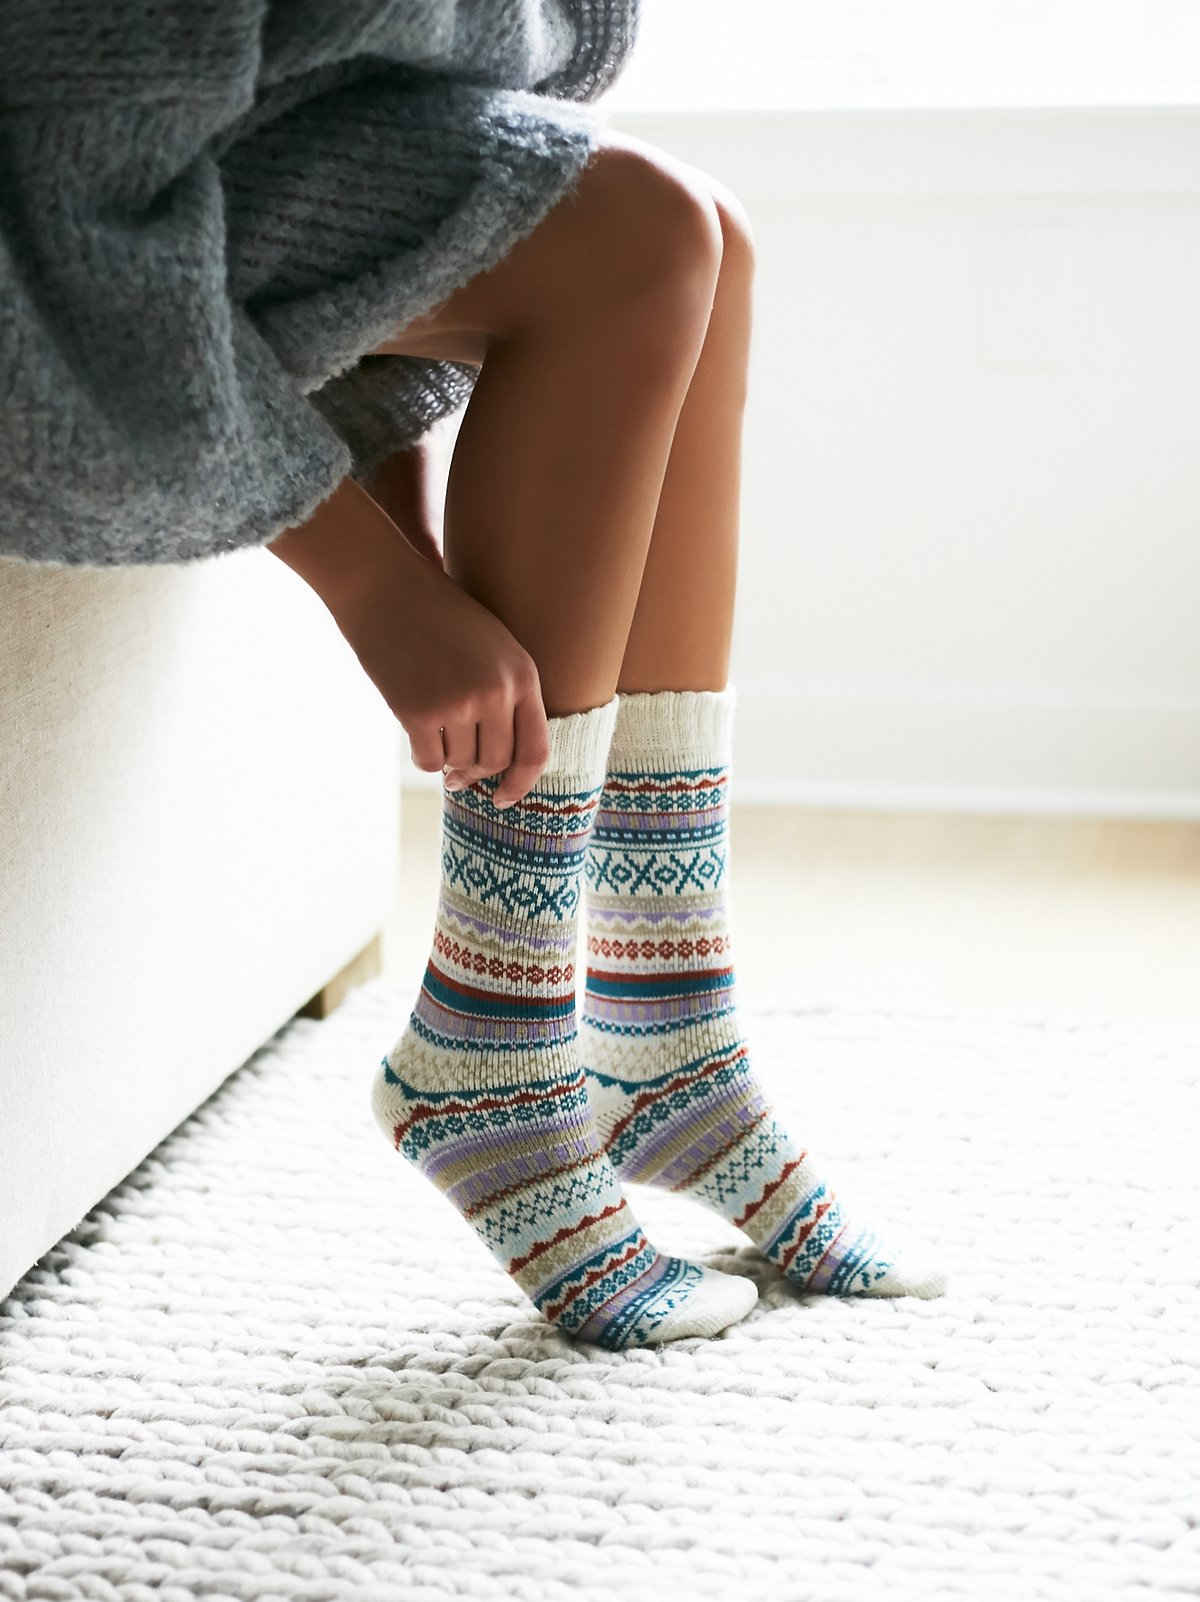 Haydon费尔岛图案袜子